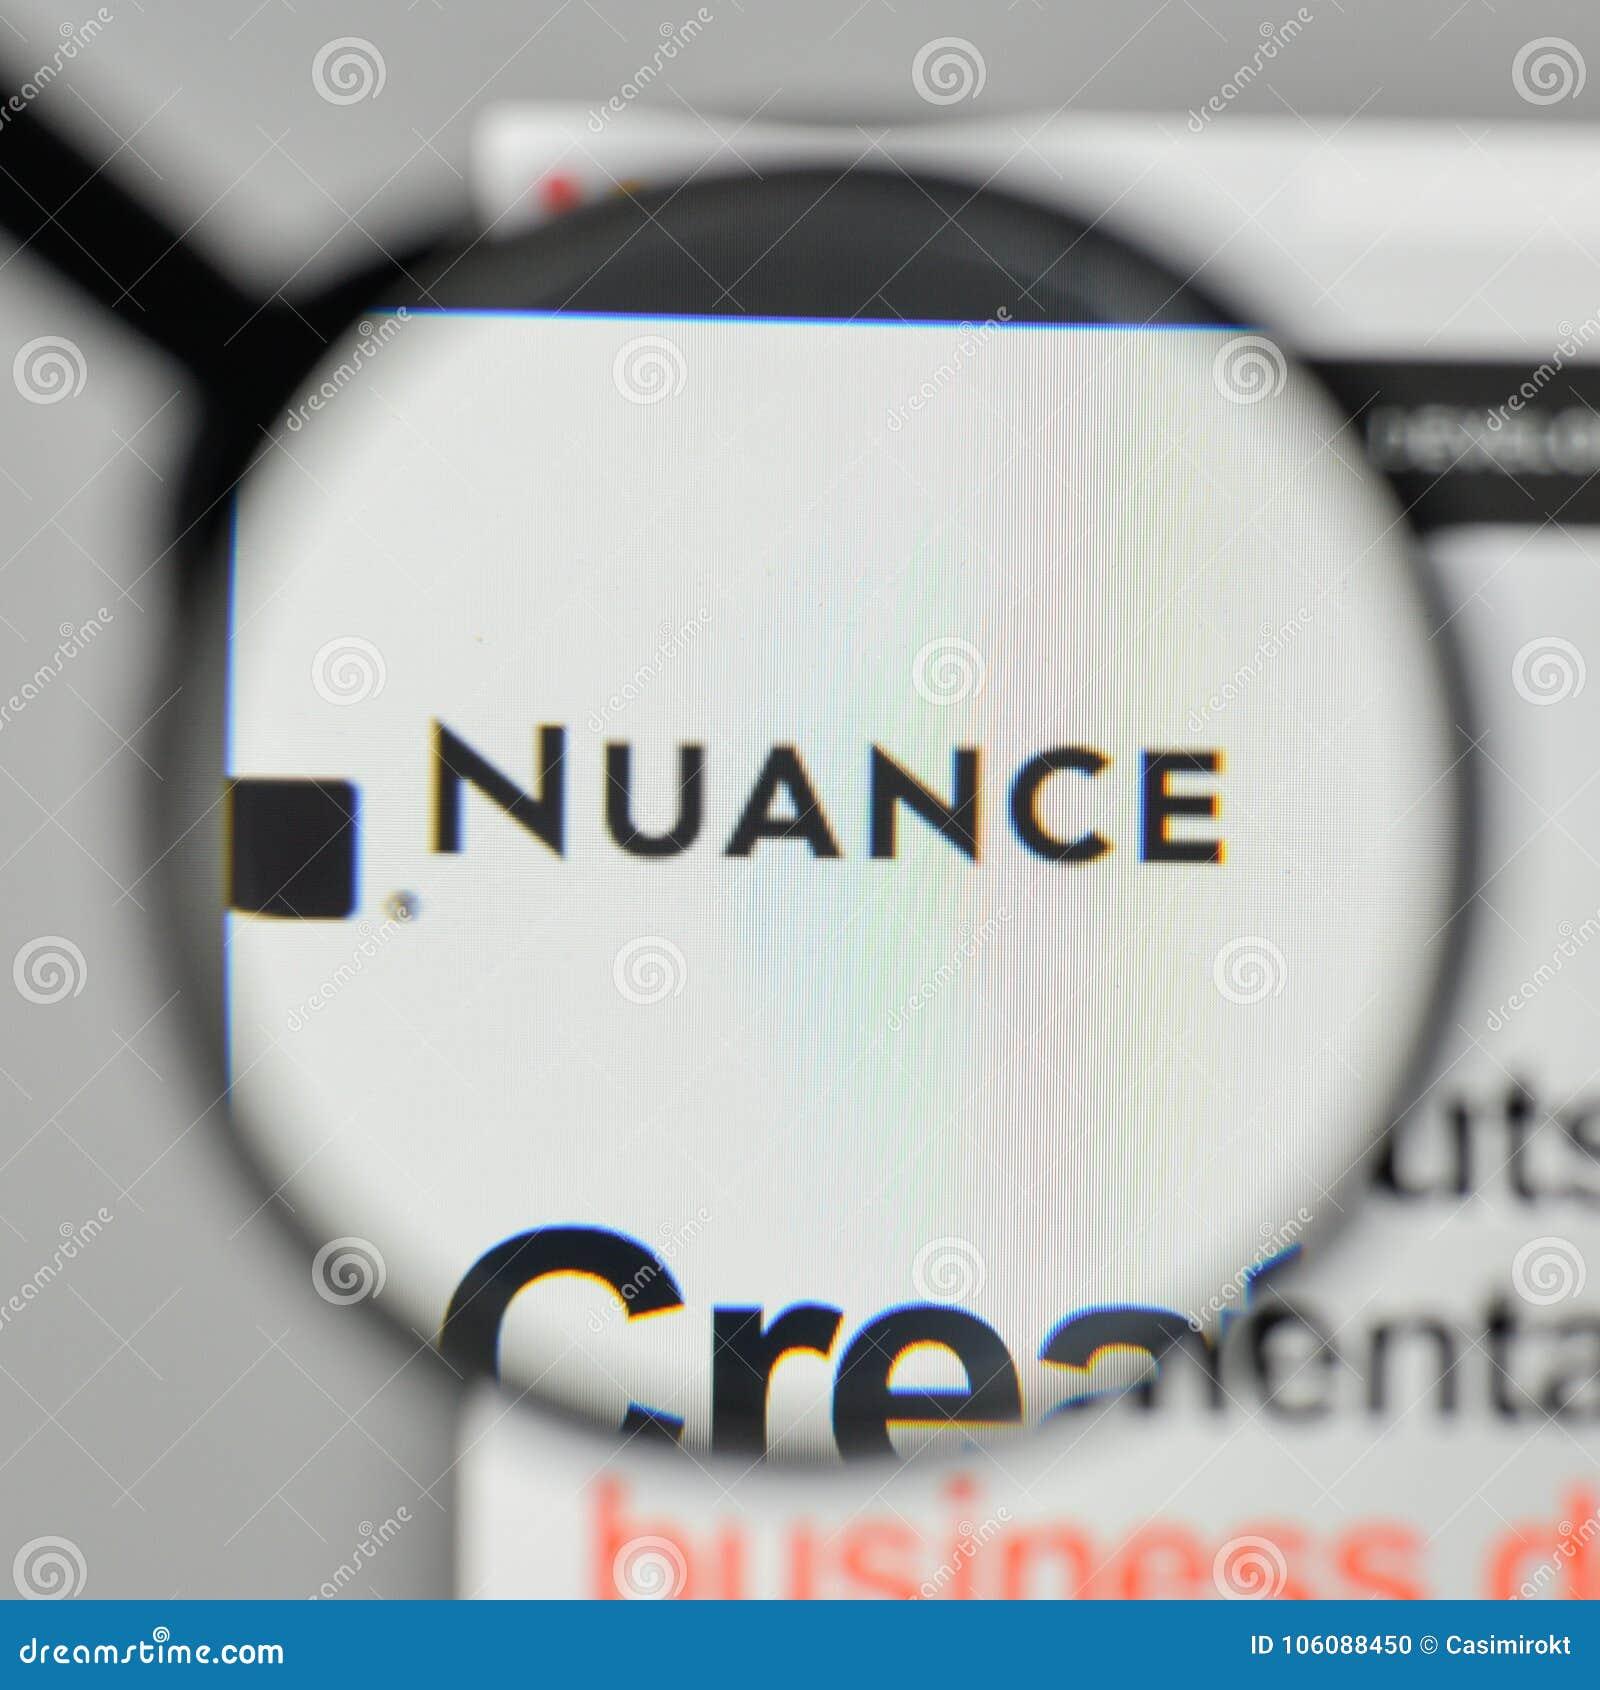 Milan, Italy - November 1, 2017: Nuance Communications Logo